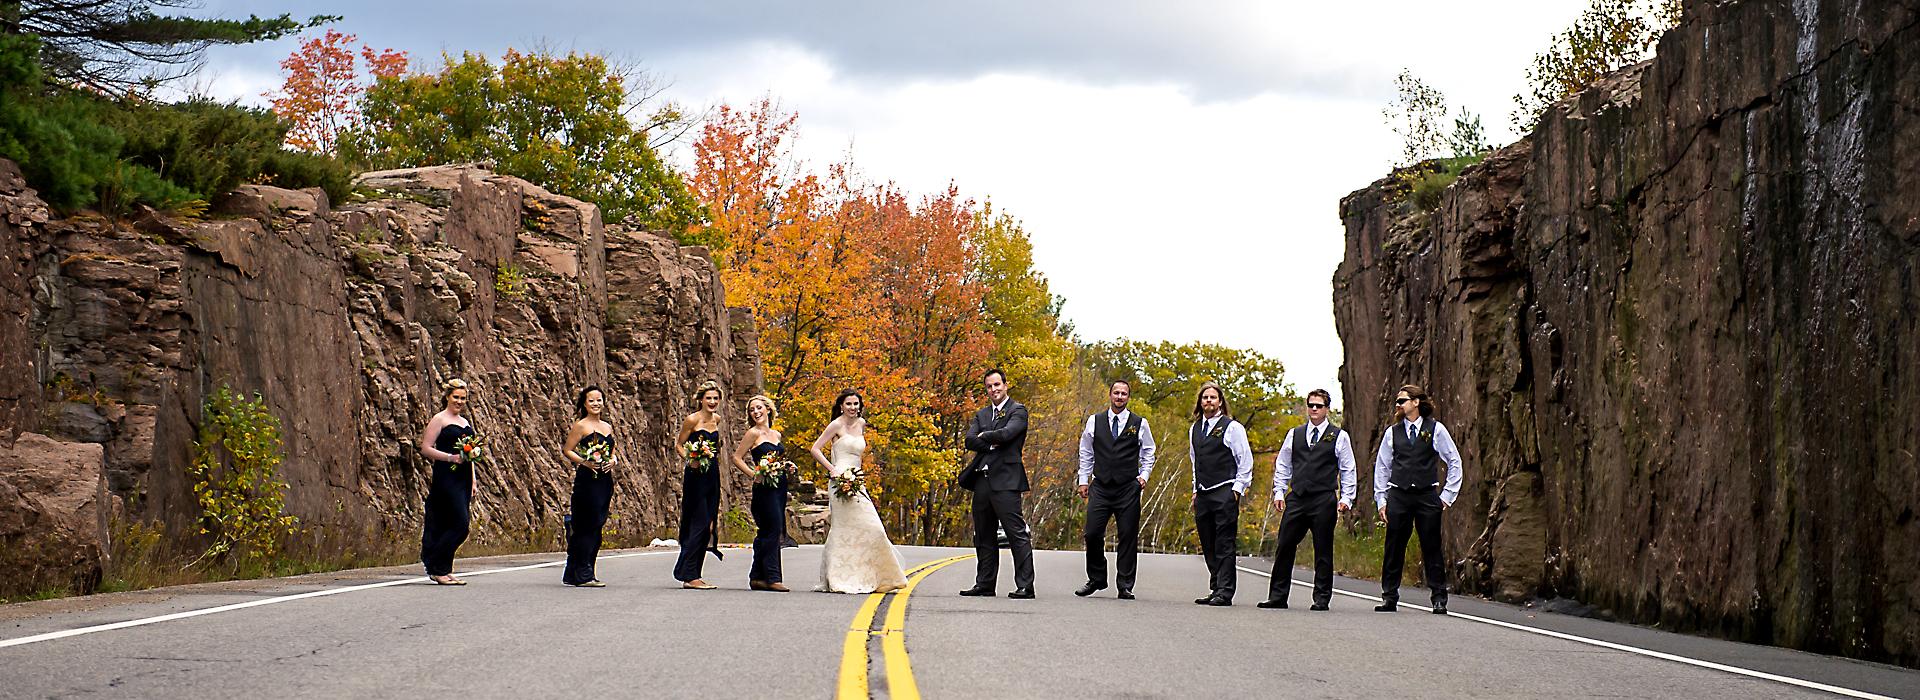 Nathan & Linda | Brooksfield Farms Wedding | Muskoka Wedding Photography23